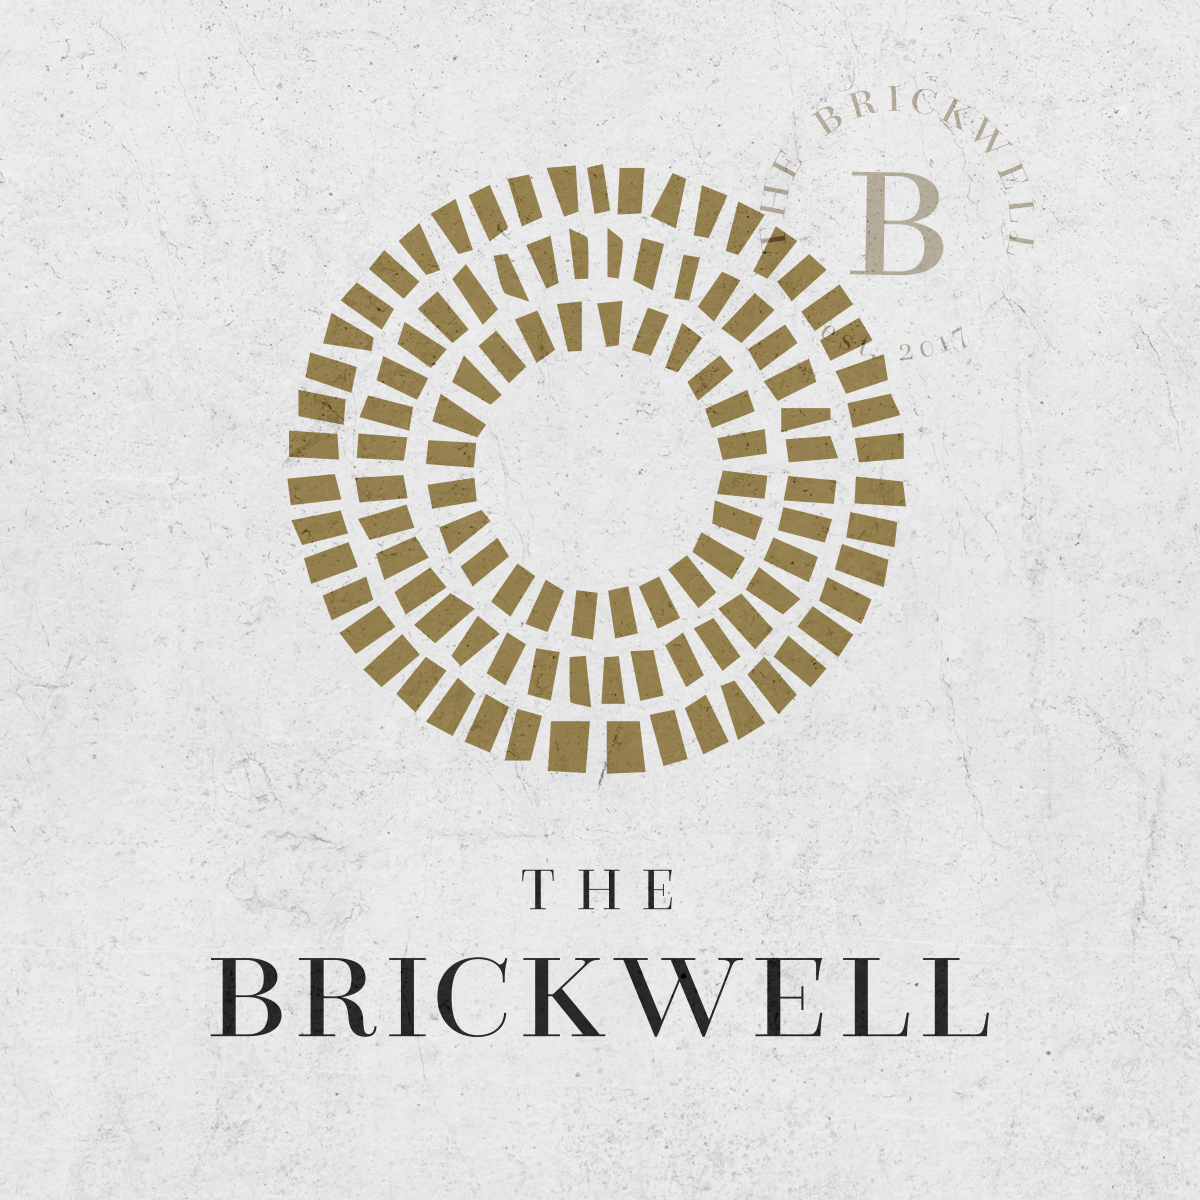 The Brickwell